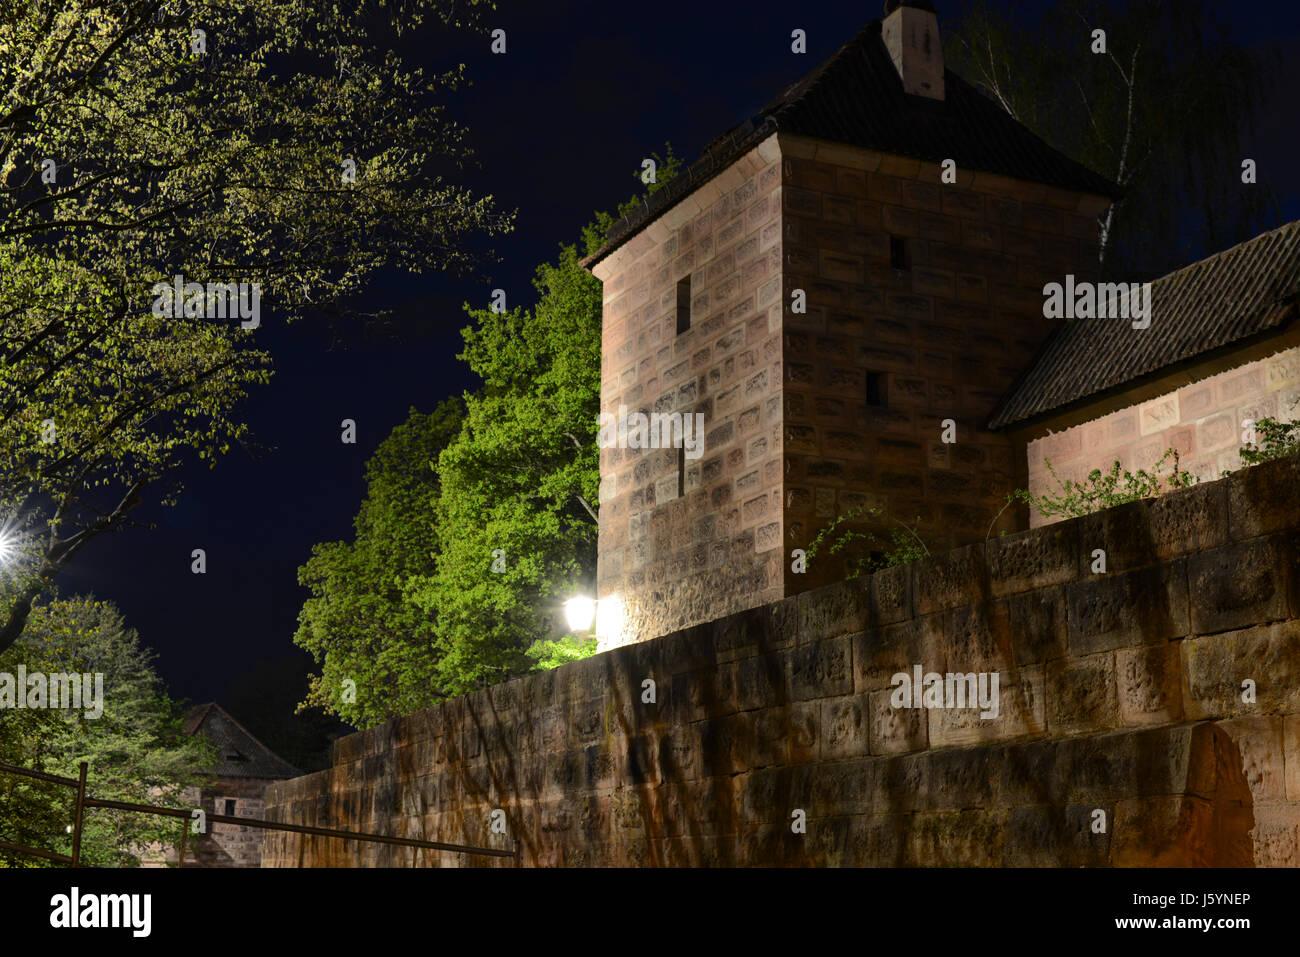 Die Nürnberger Stadtmauer bei Nacht. City walls of Nuremberg by night. - Stock Image